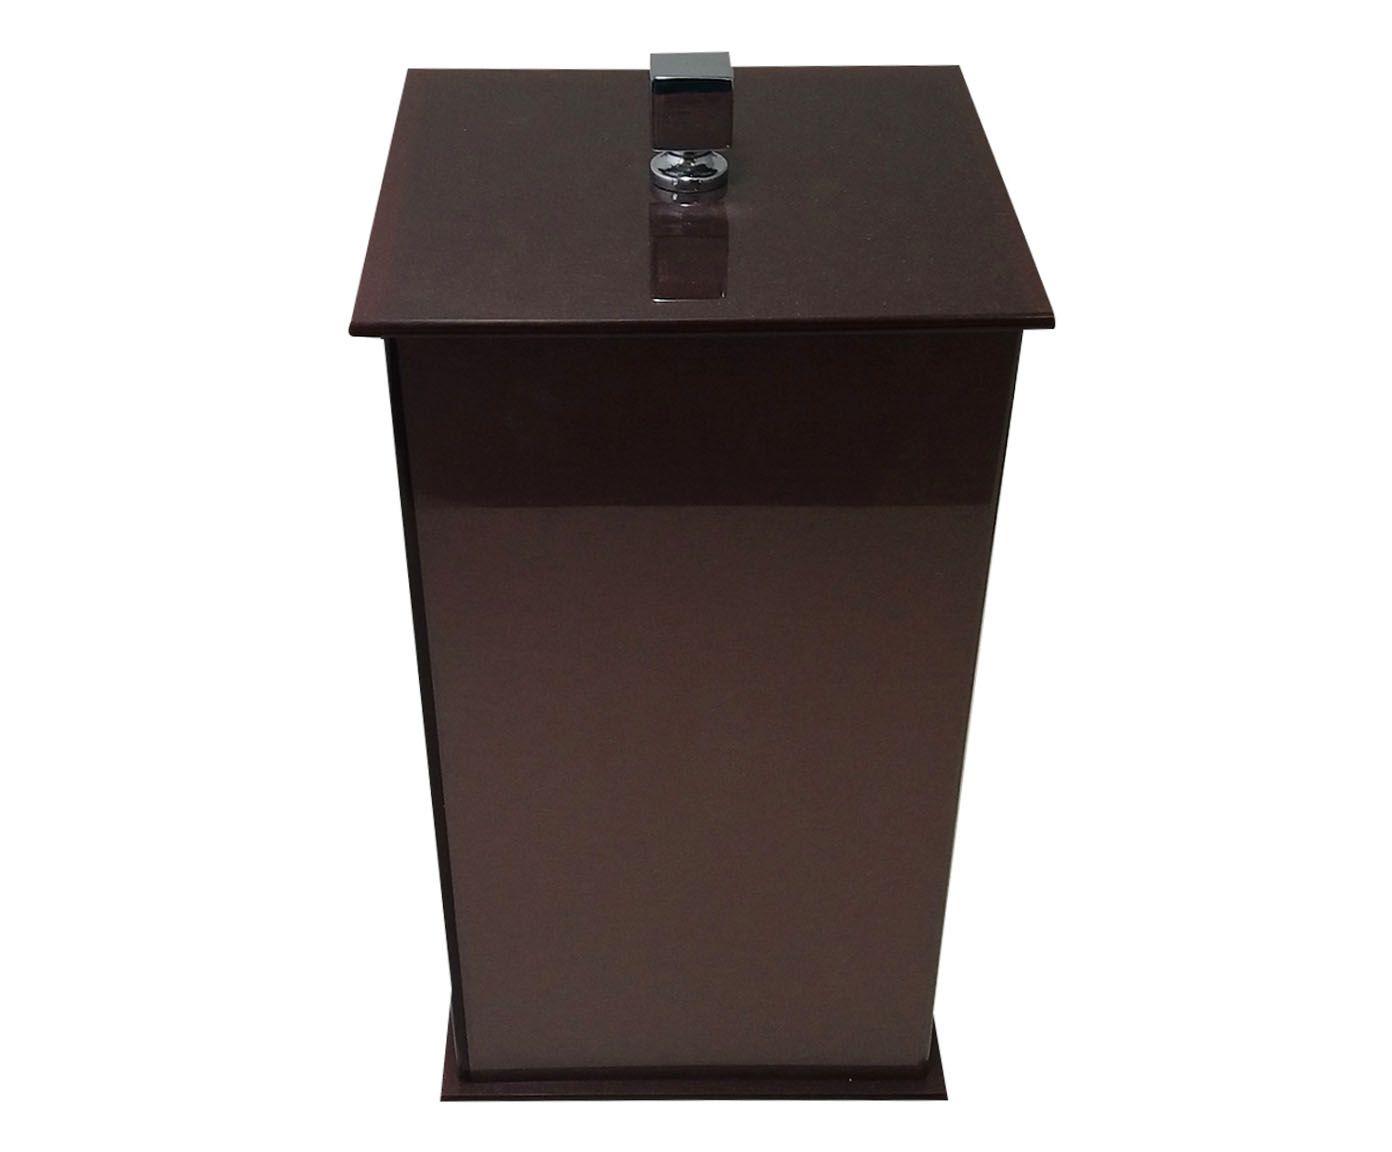 Lixeira Decor Slim Chocolate - 14,8X28X14,8cm | Westwing.com.br